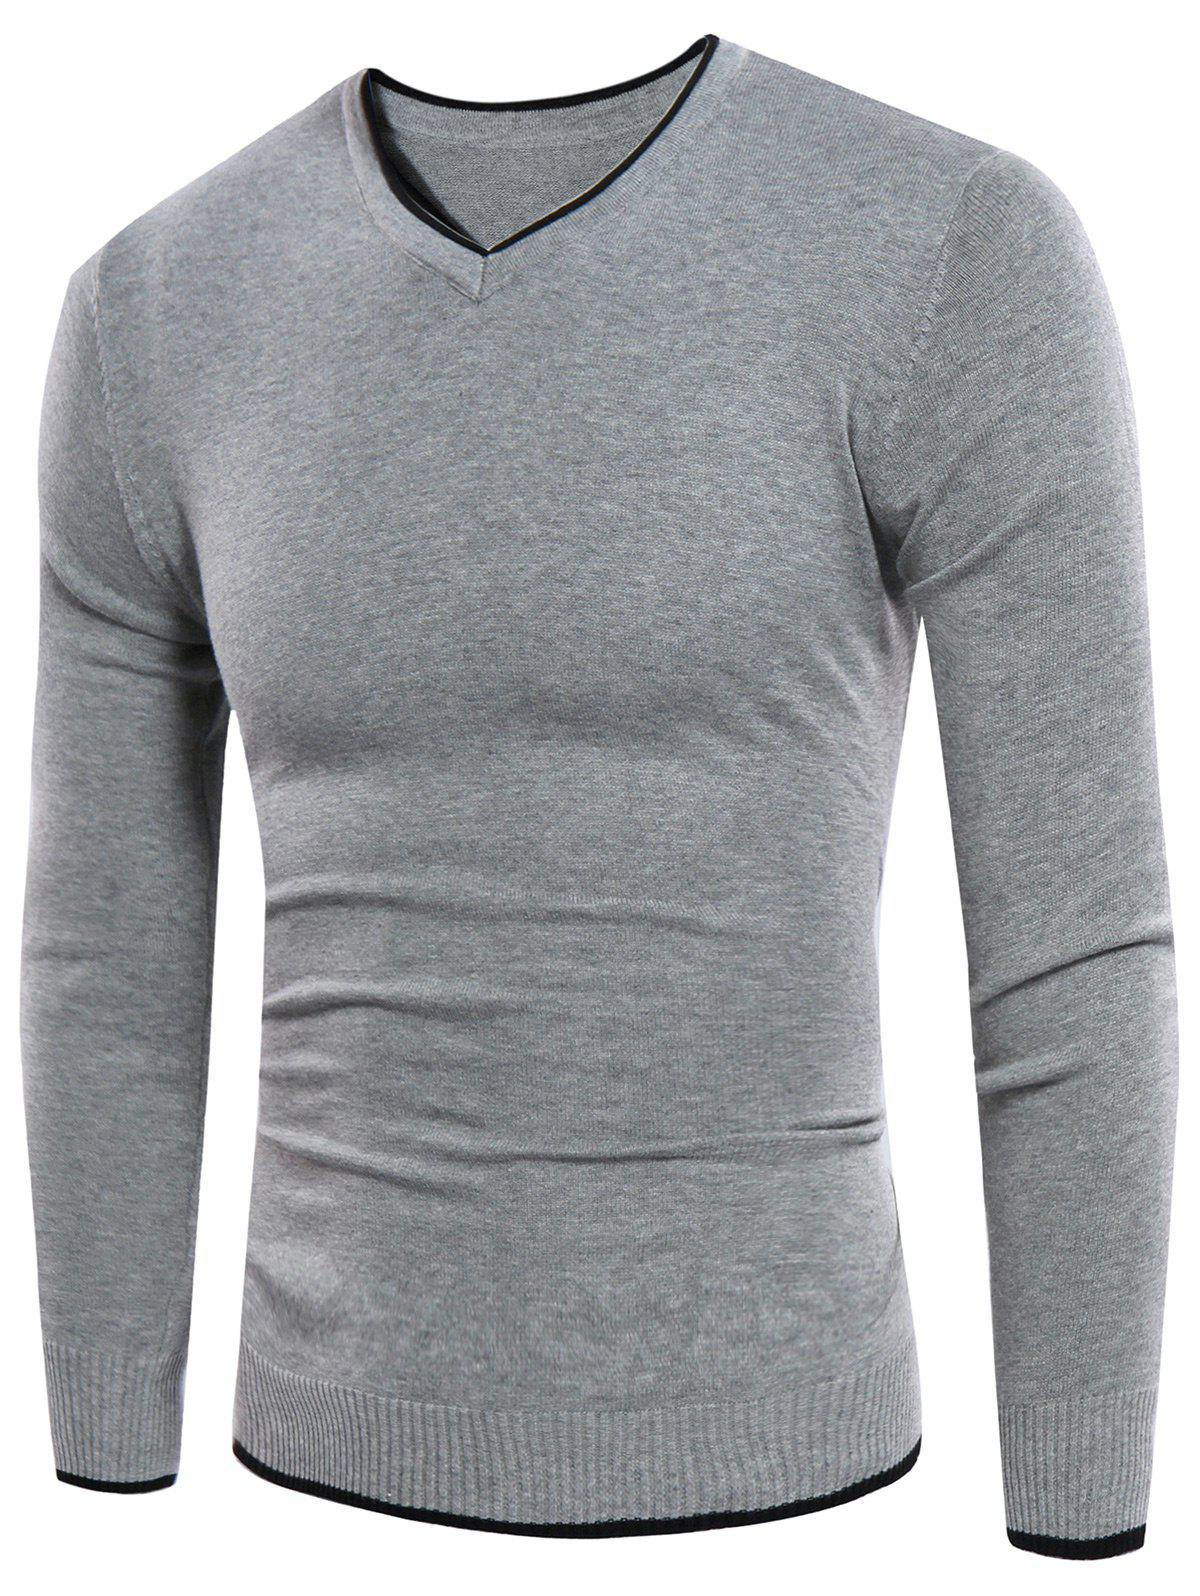 V Neck Knitting Rib Design Sweater 218003503